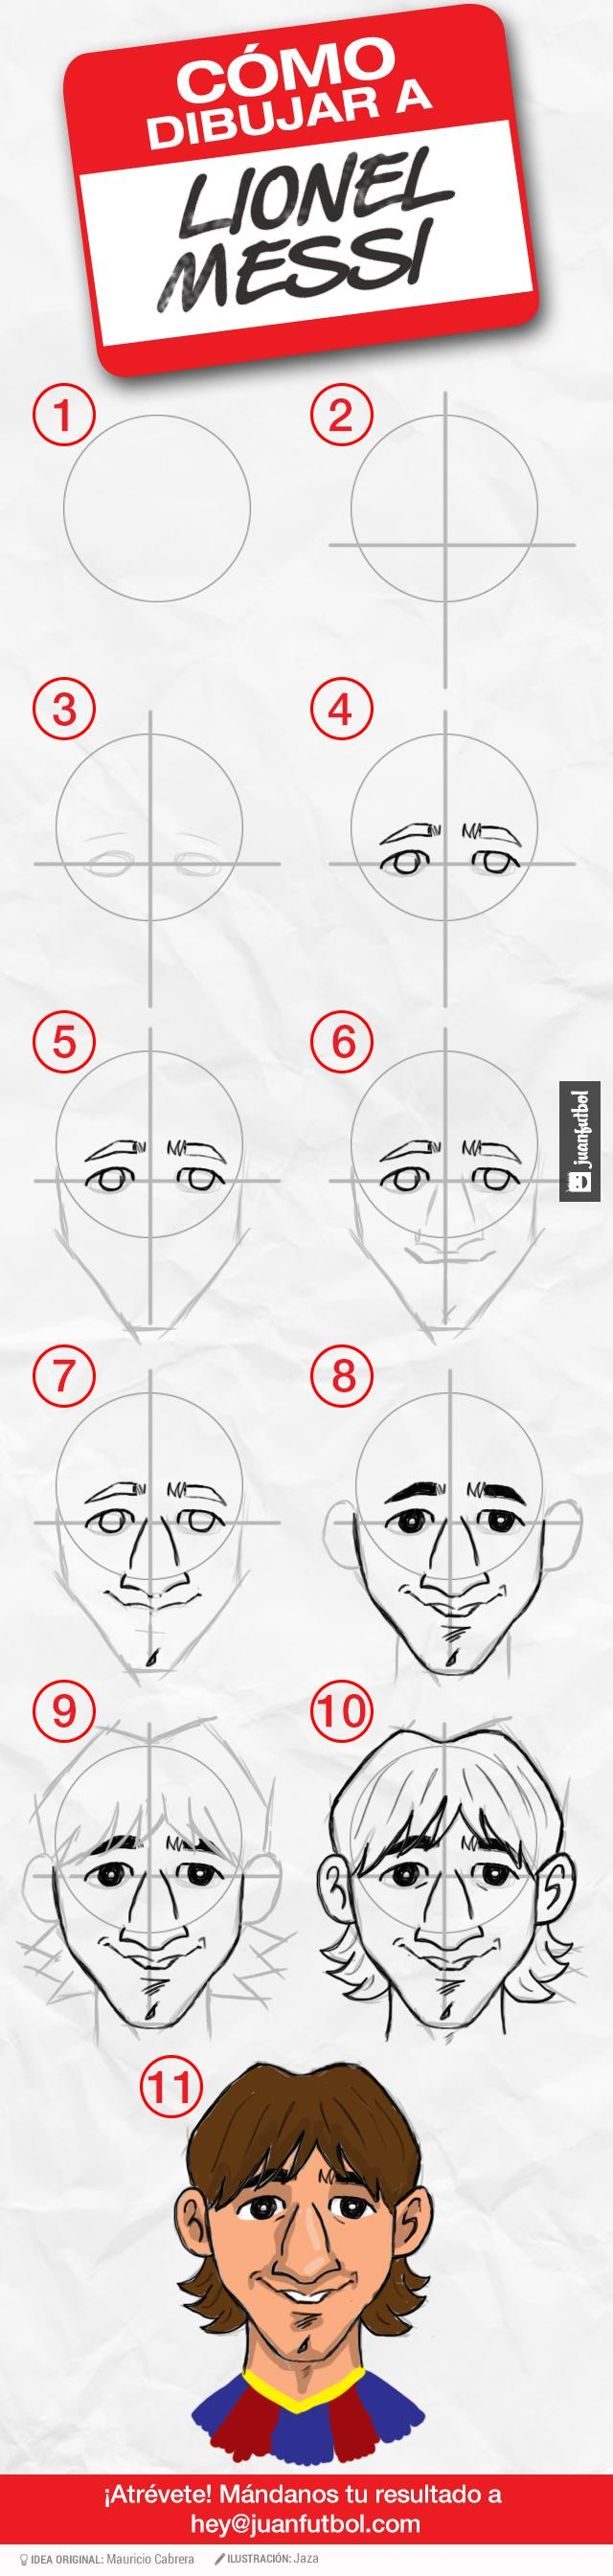 Messi En 11 Pasos Messi Dibujo James Rodriguez Como Dibujar